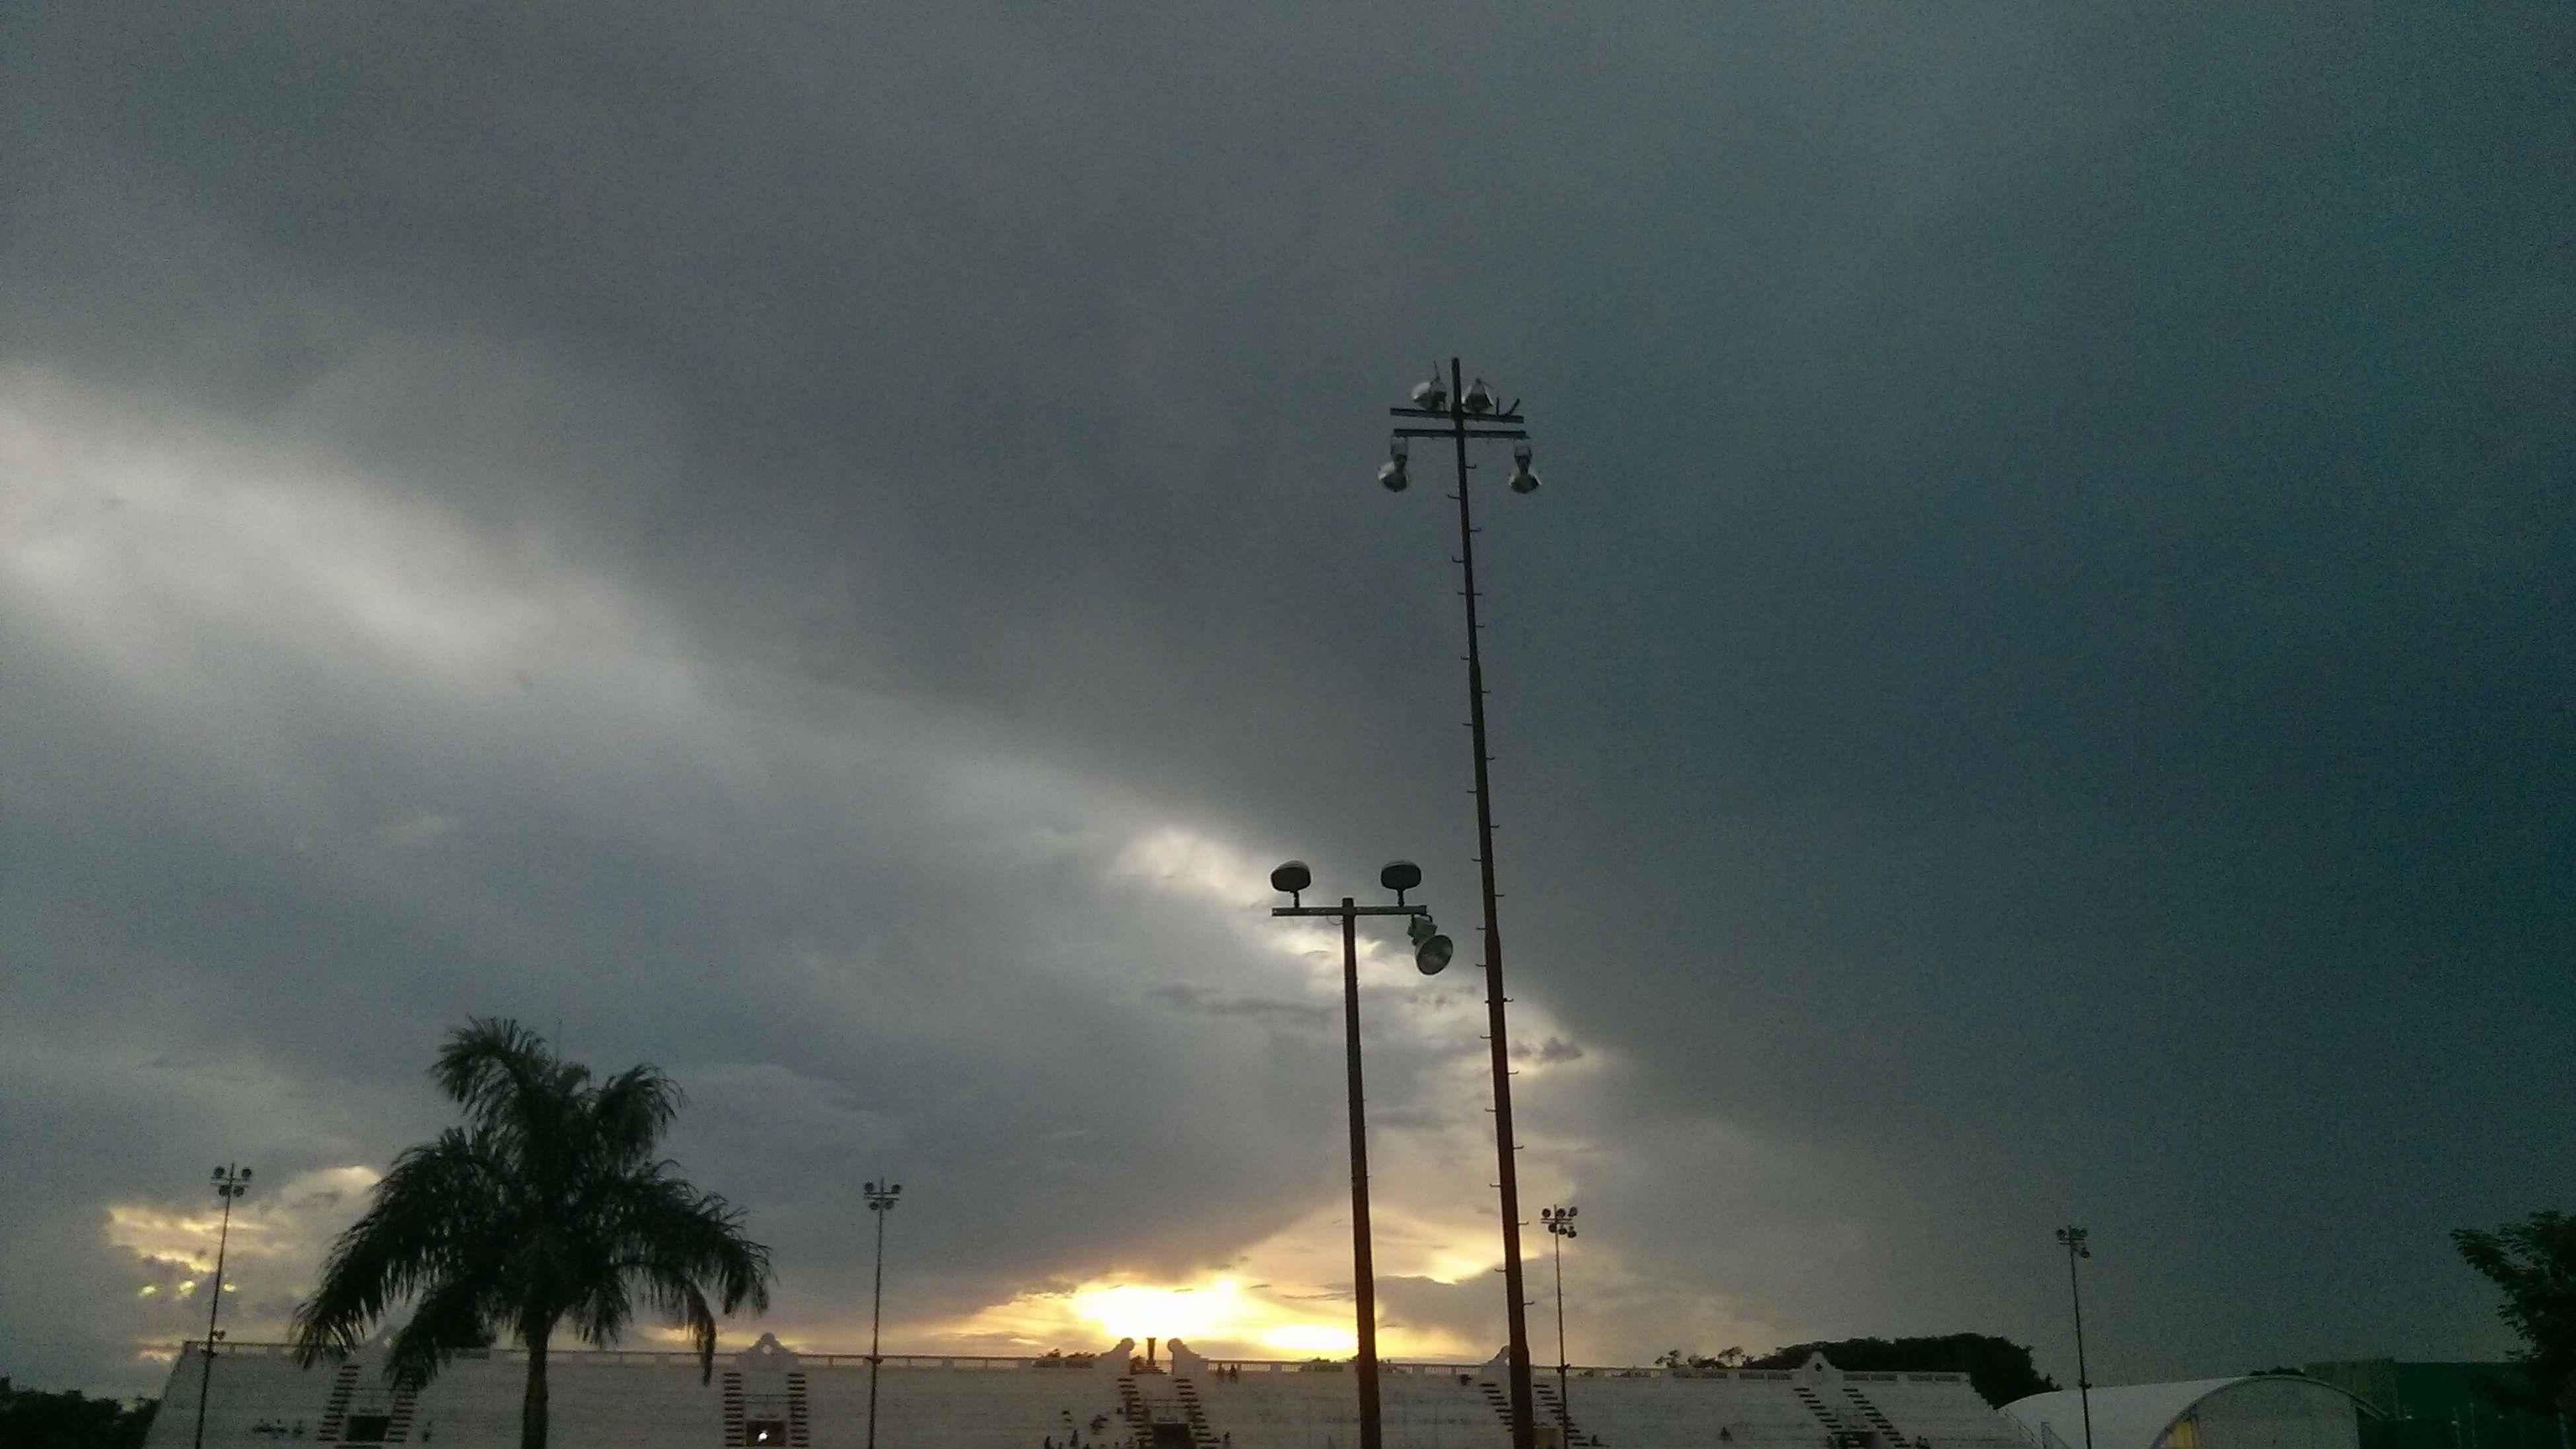 Sunset nofilter Celpic